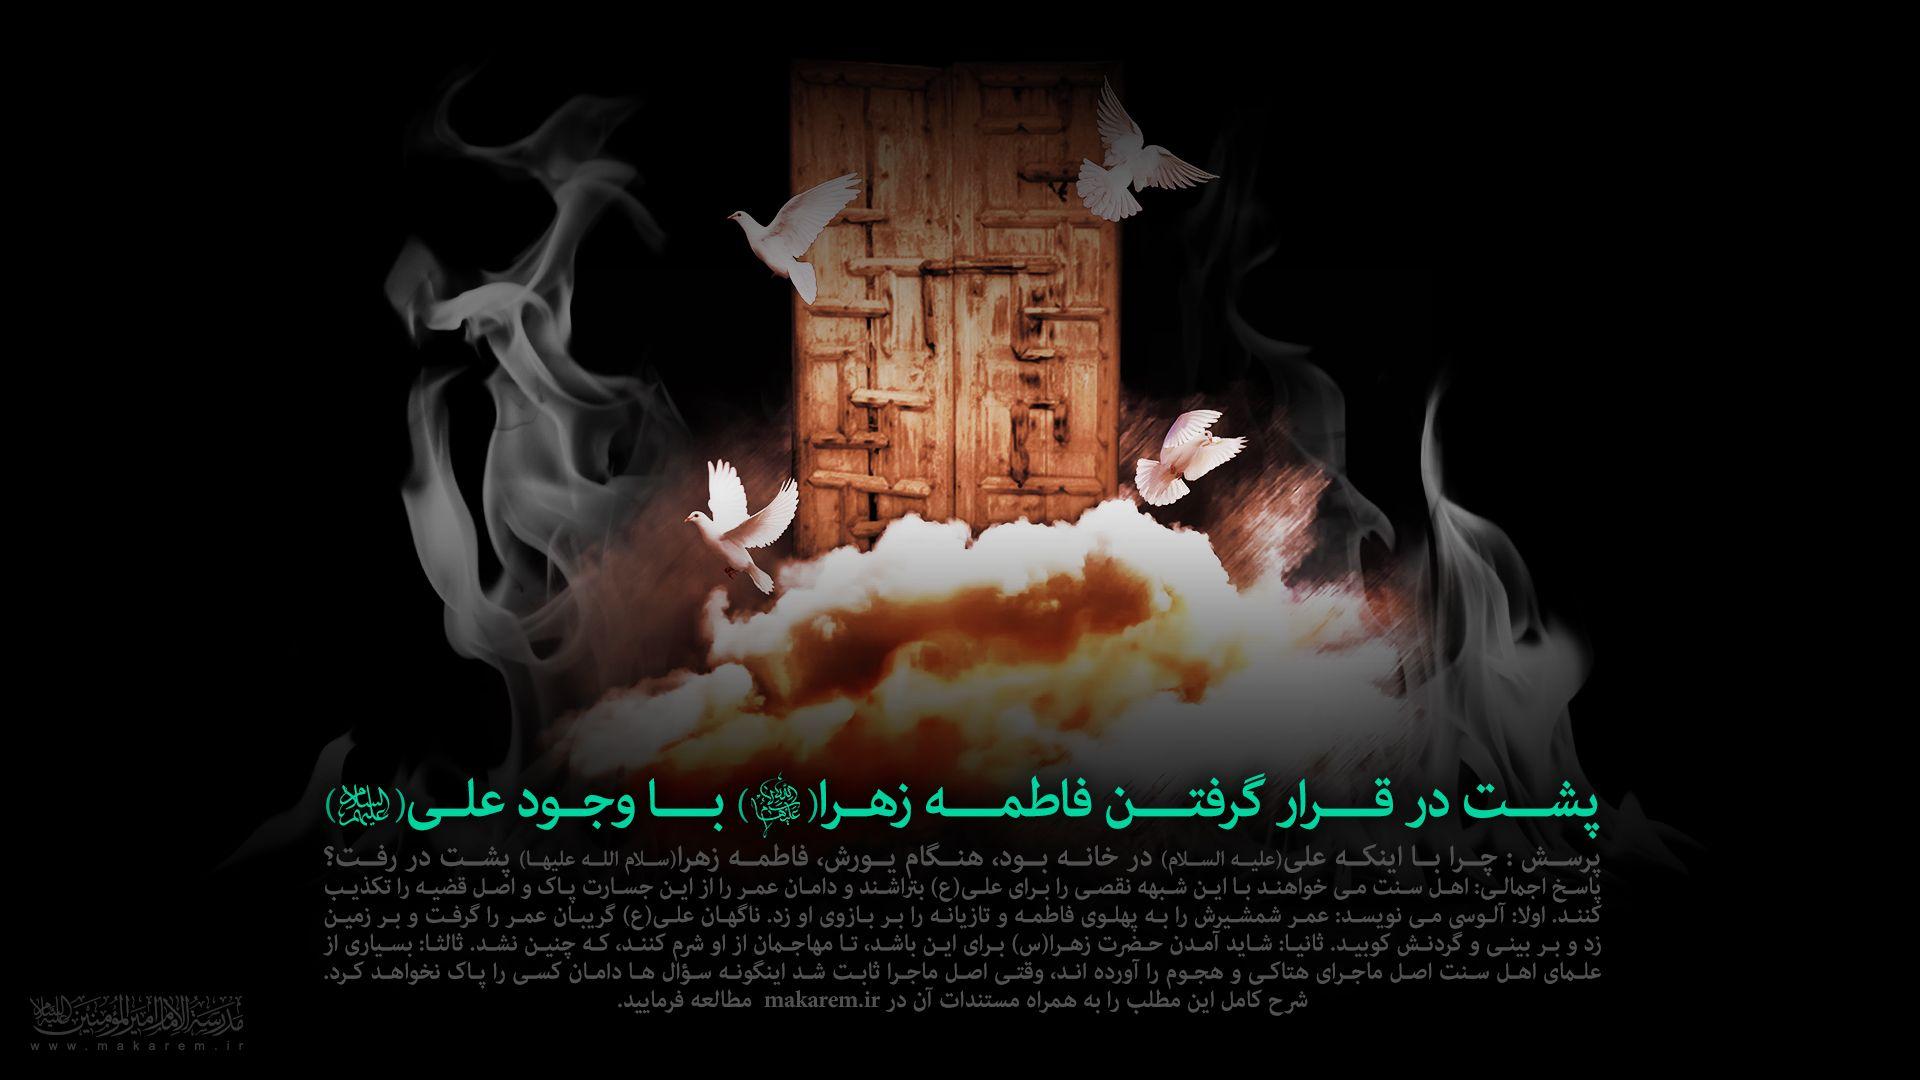 حضرت مادر 08-مدرسه الامام امیر المومنین (ع)